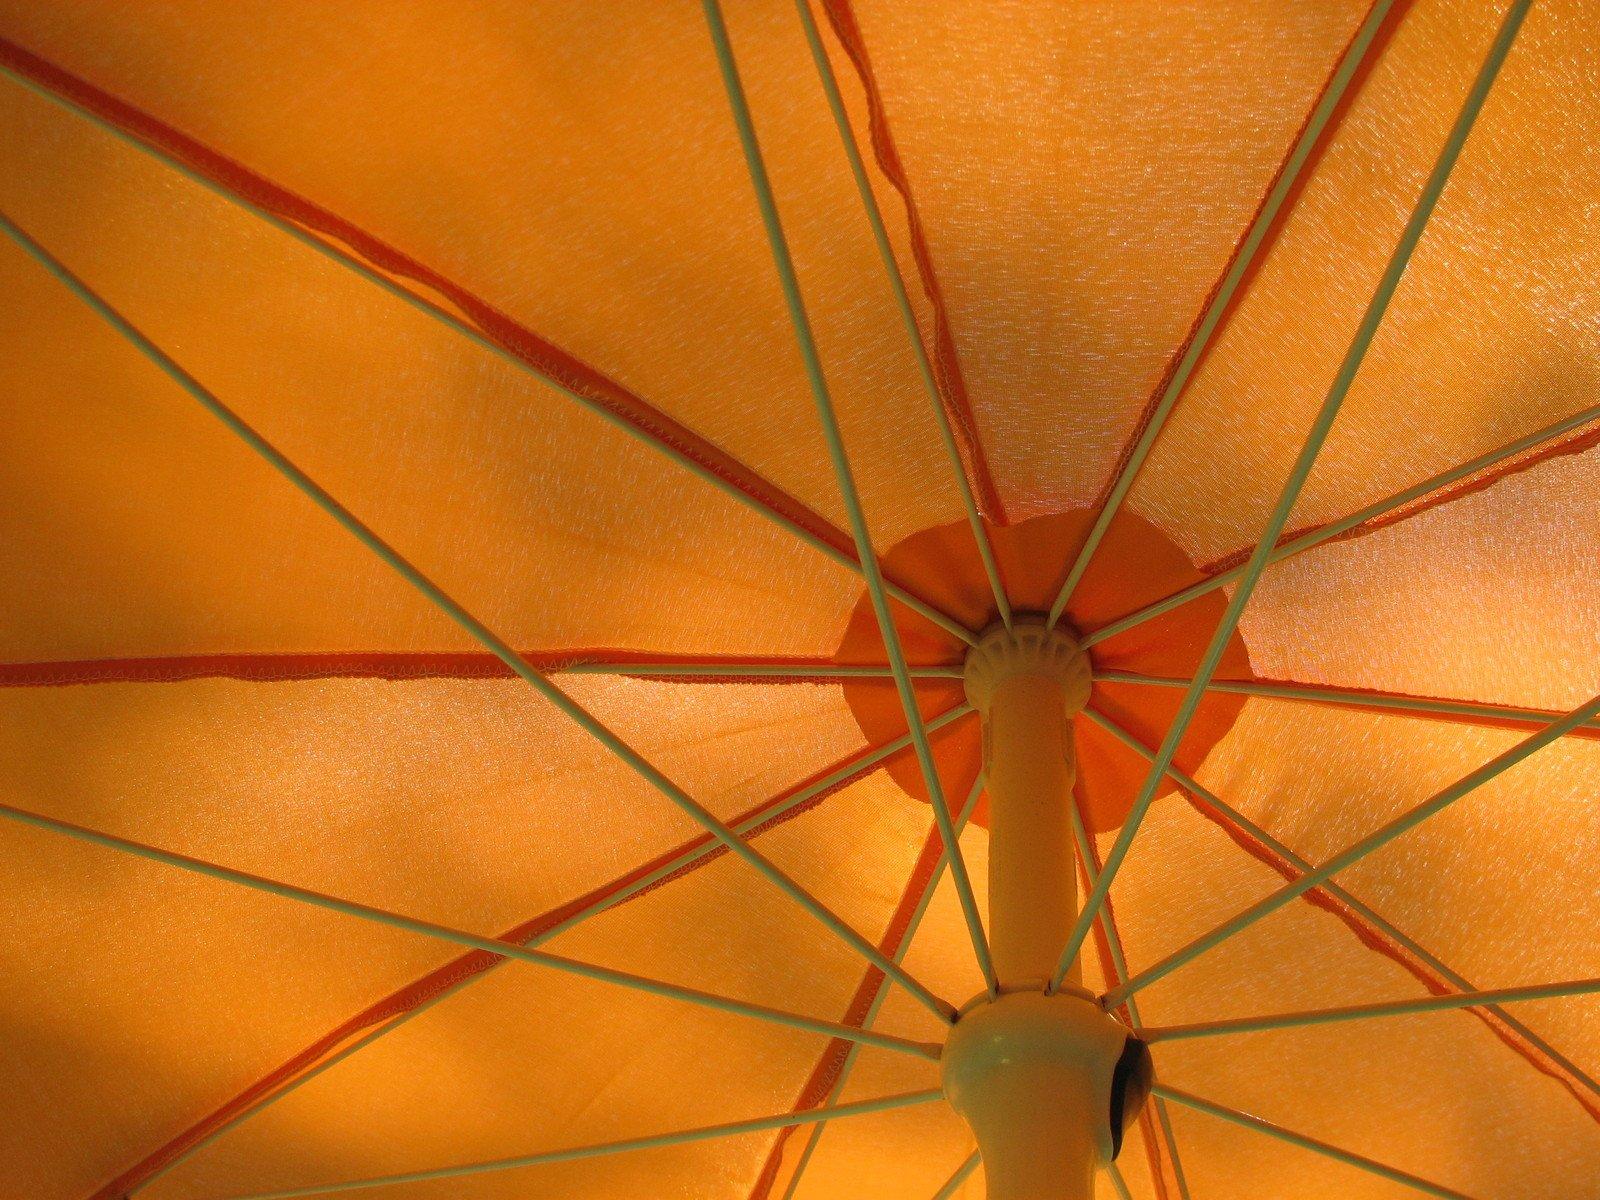 guarda-chuva, férias, laranja, verão